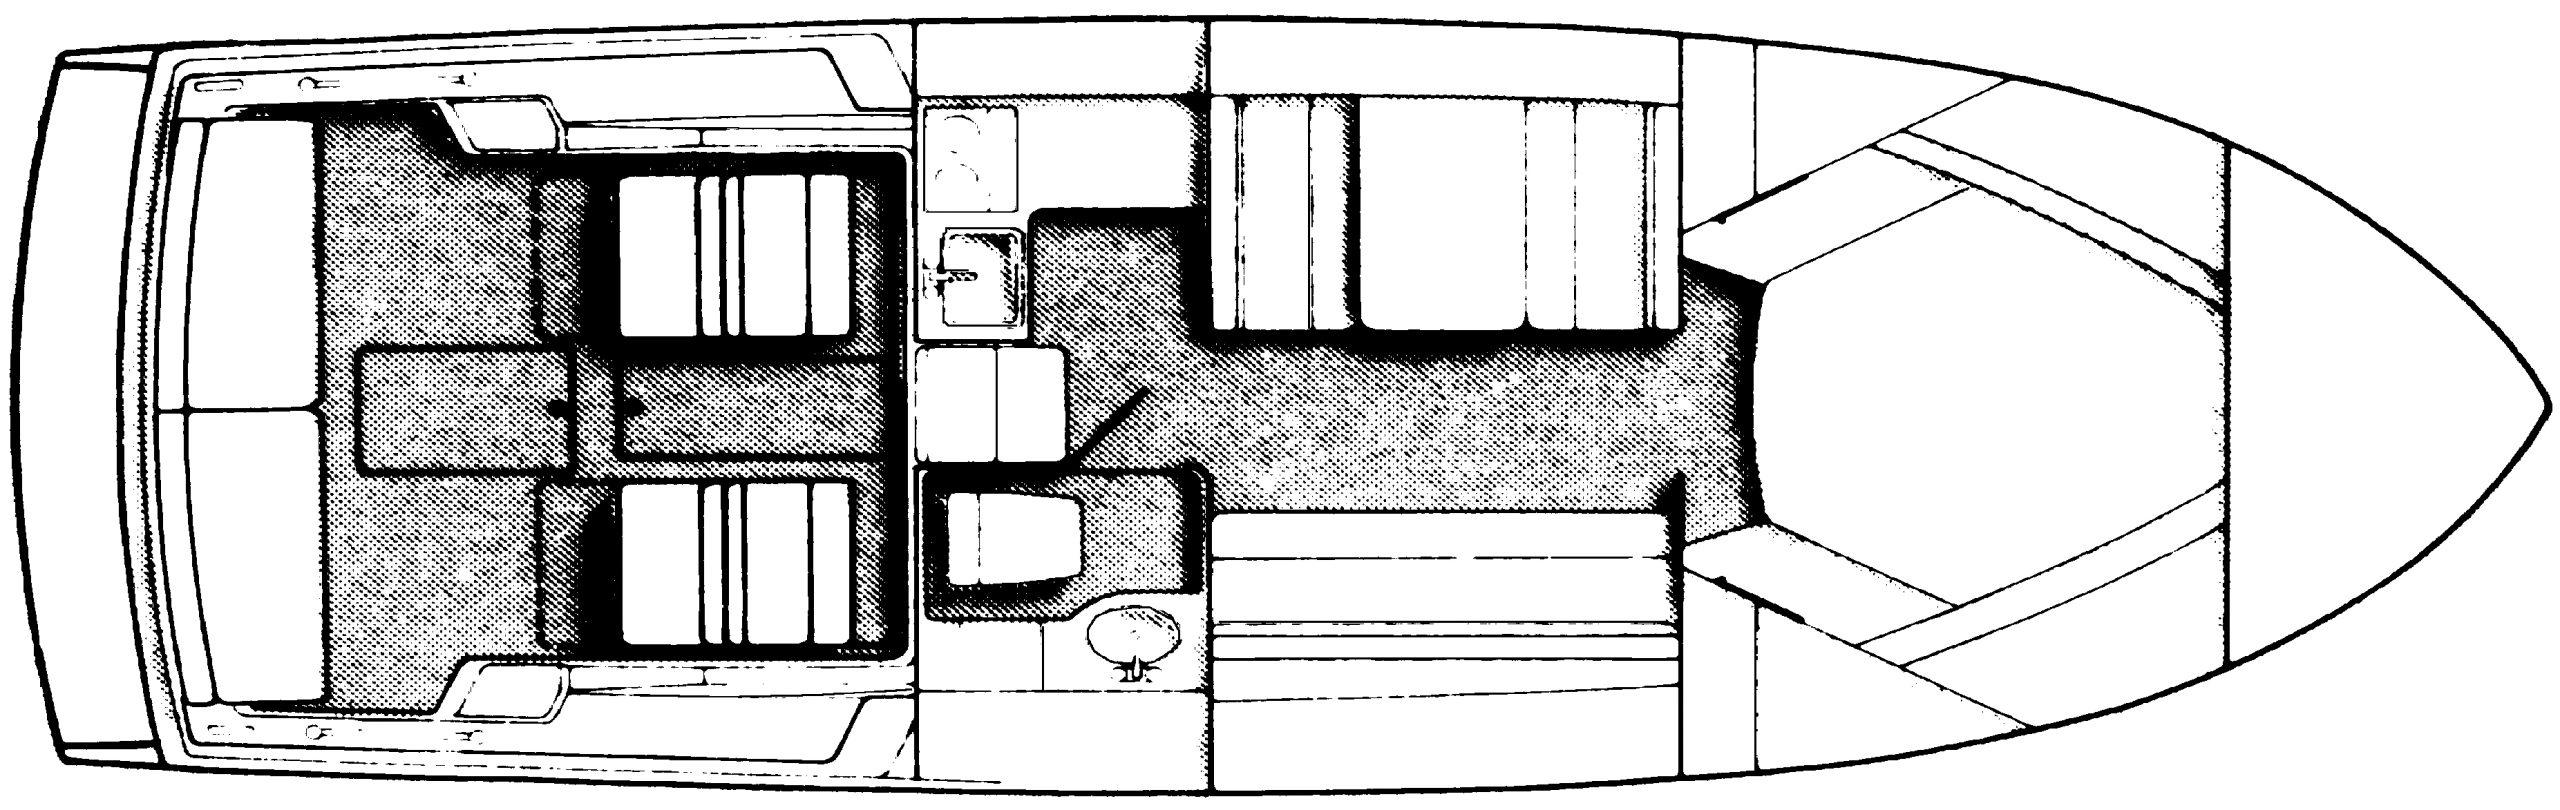 320-322 Amerosport Express Floor Plan 1